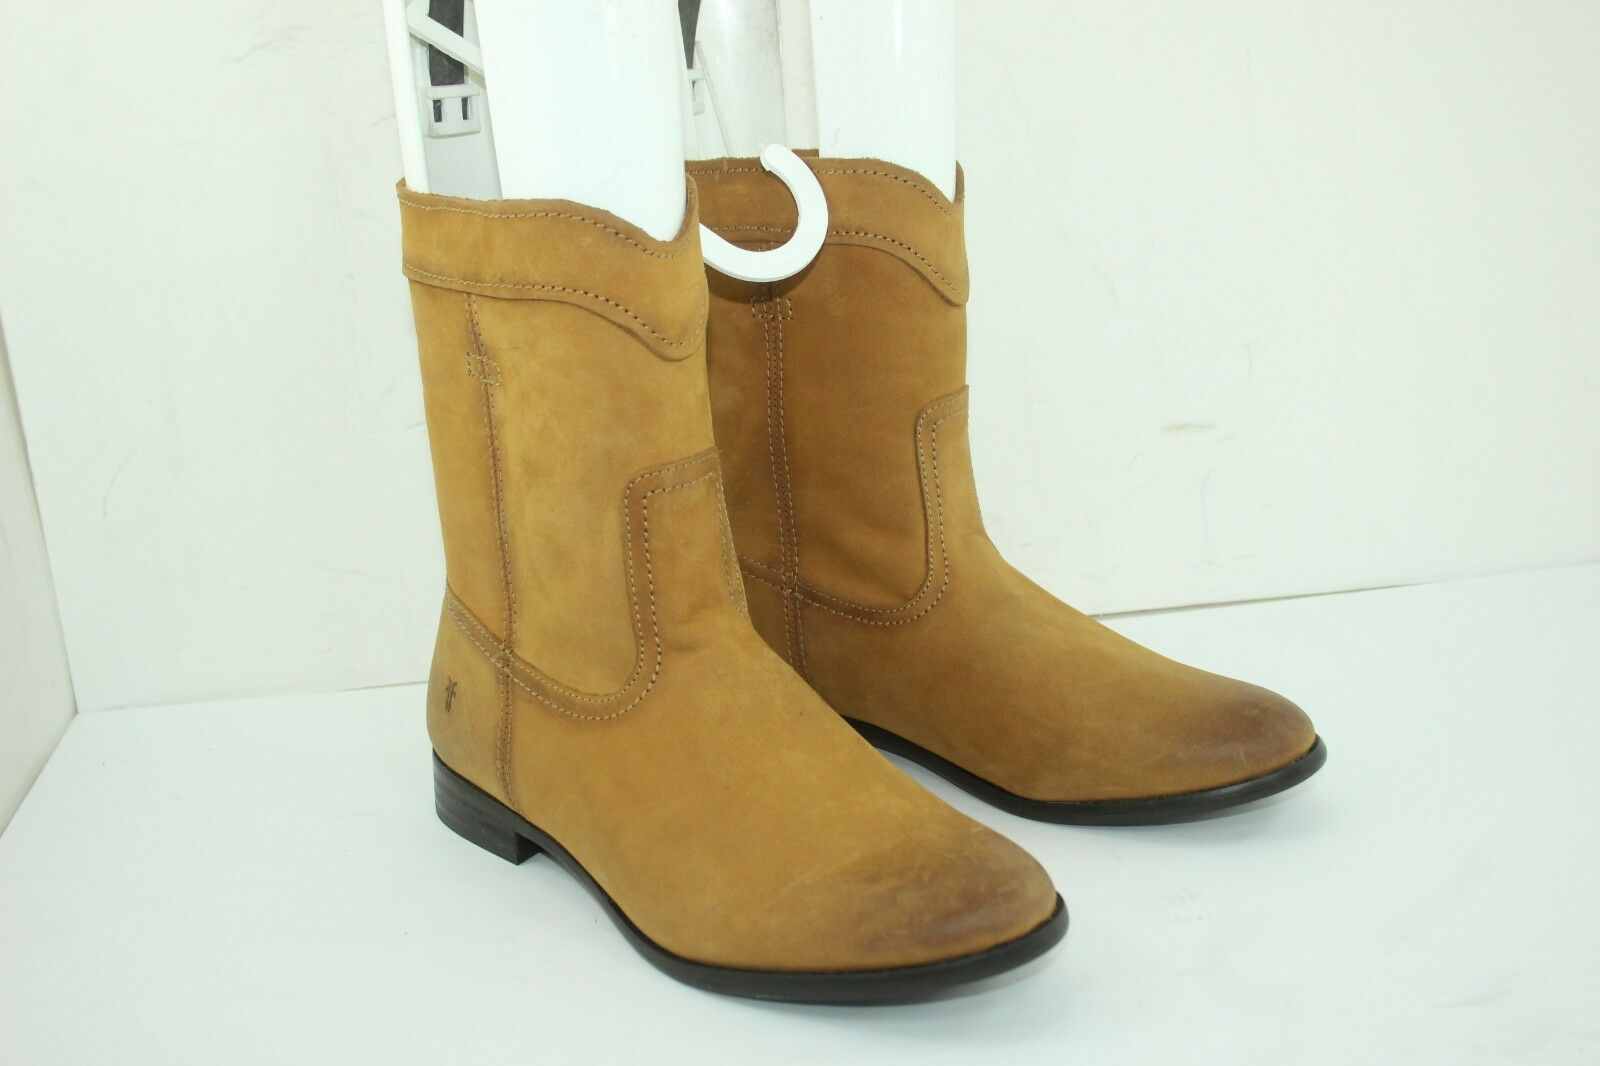 Frye Cara Roper Short Riding Boots SZ 8.5Womens Leather Cowboy Round Toe Cognac2